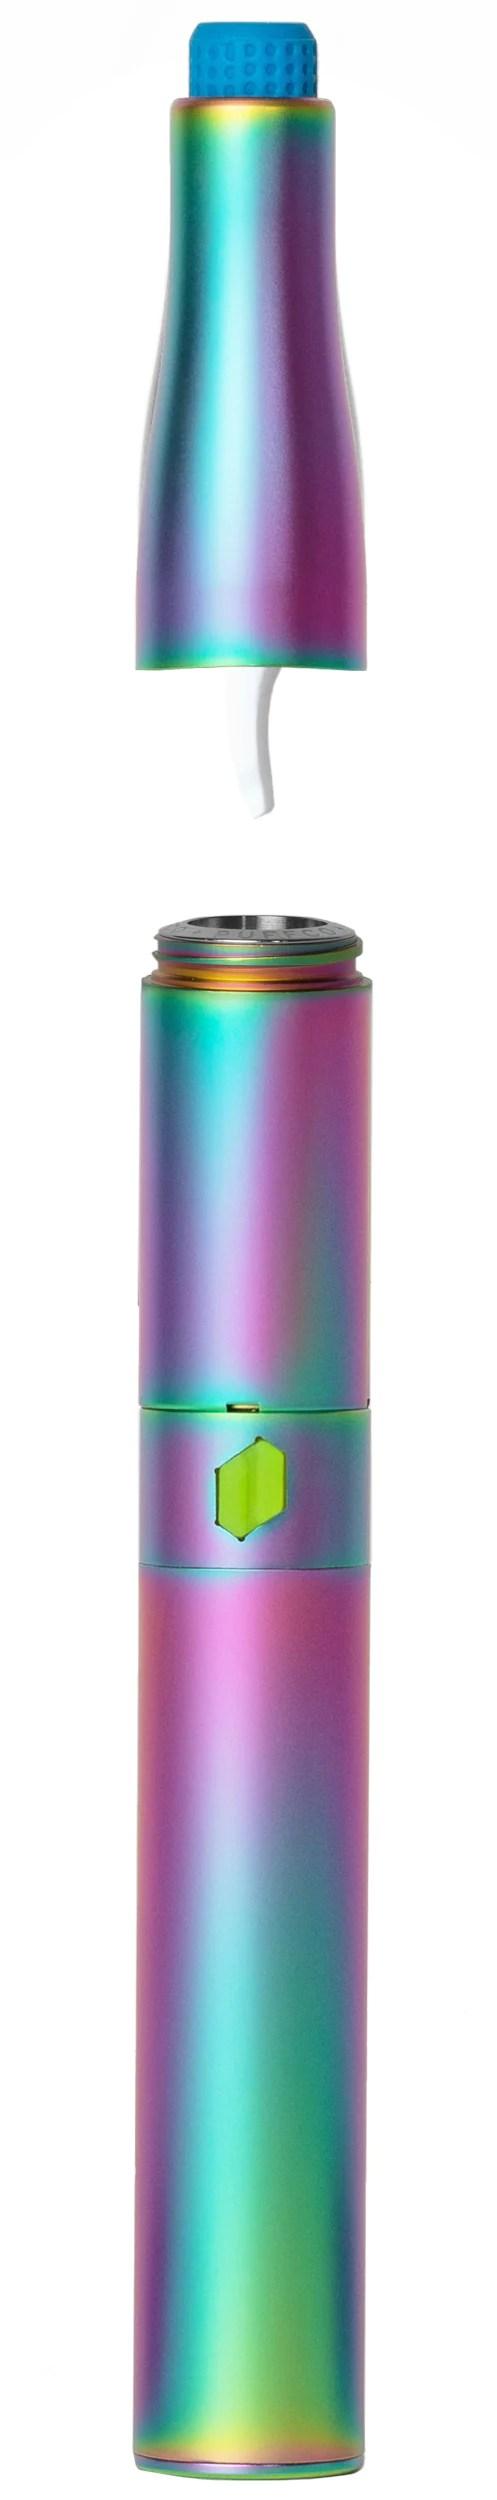 Puffco Peak Rainbow : puffco, rainbow, Puffco, First, Pocket, Portable, Ceramic, Vaporizer